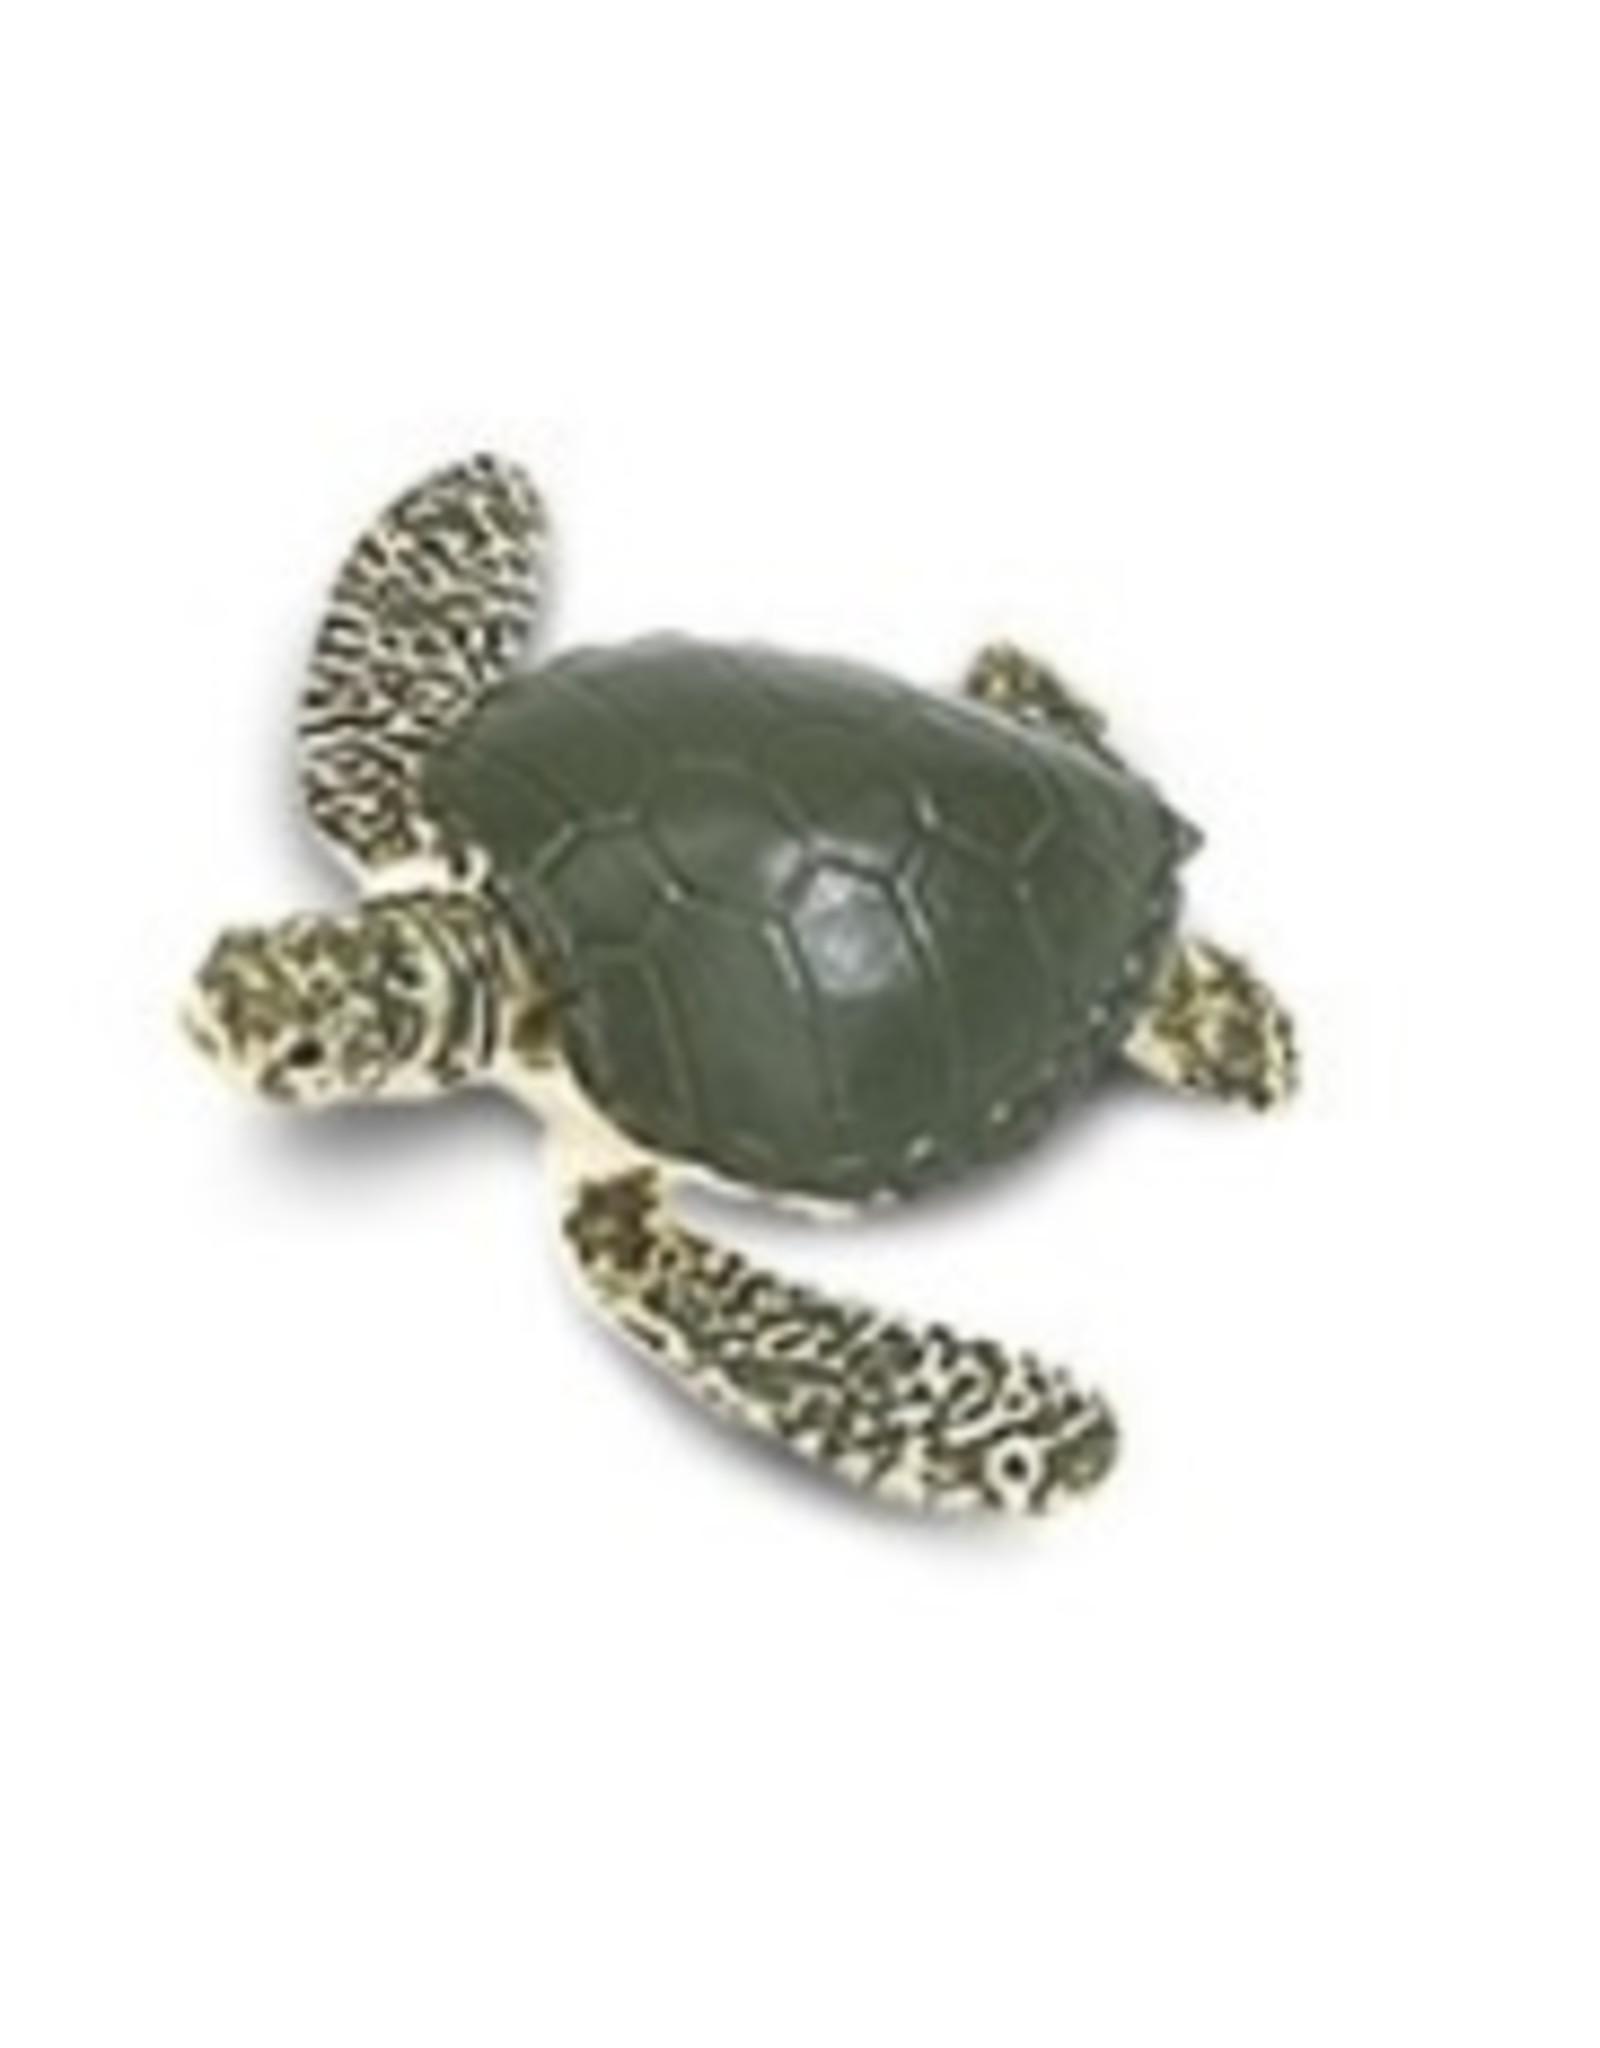 Goodluck mini - zee schildpad